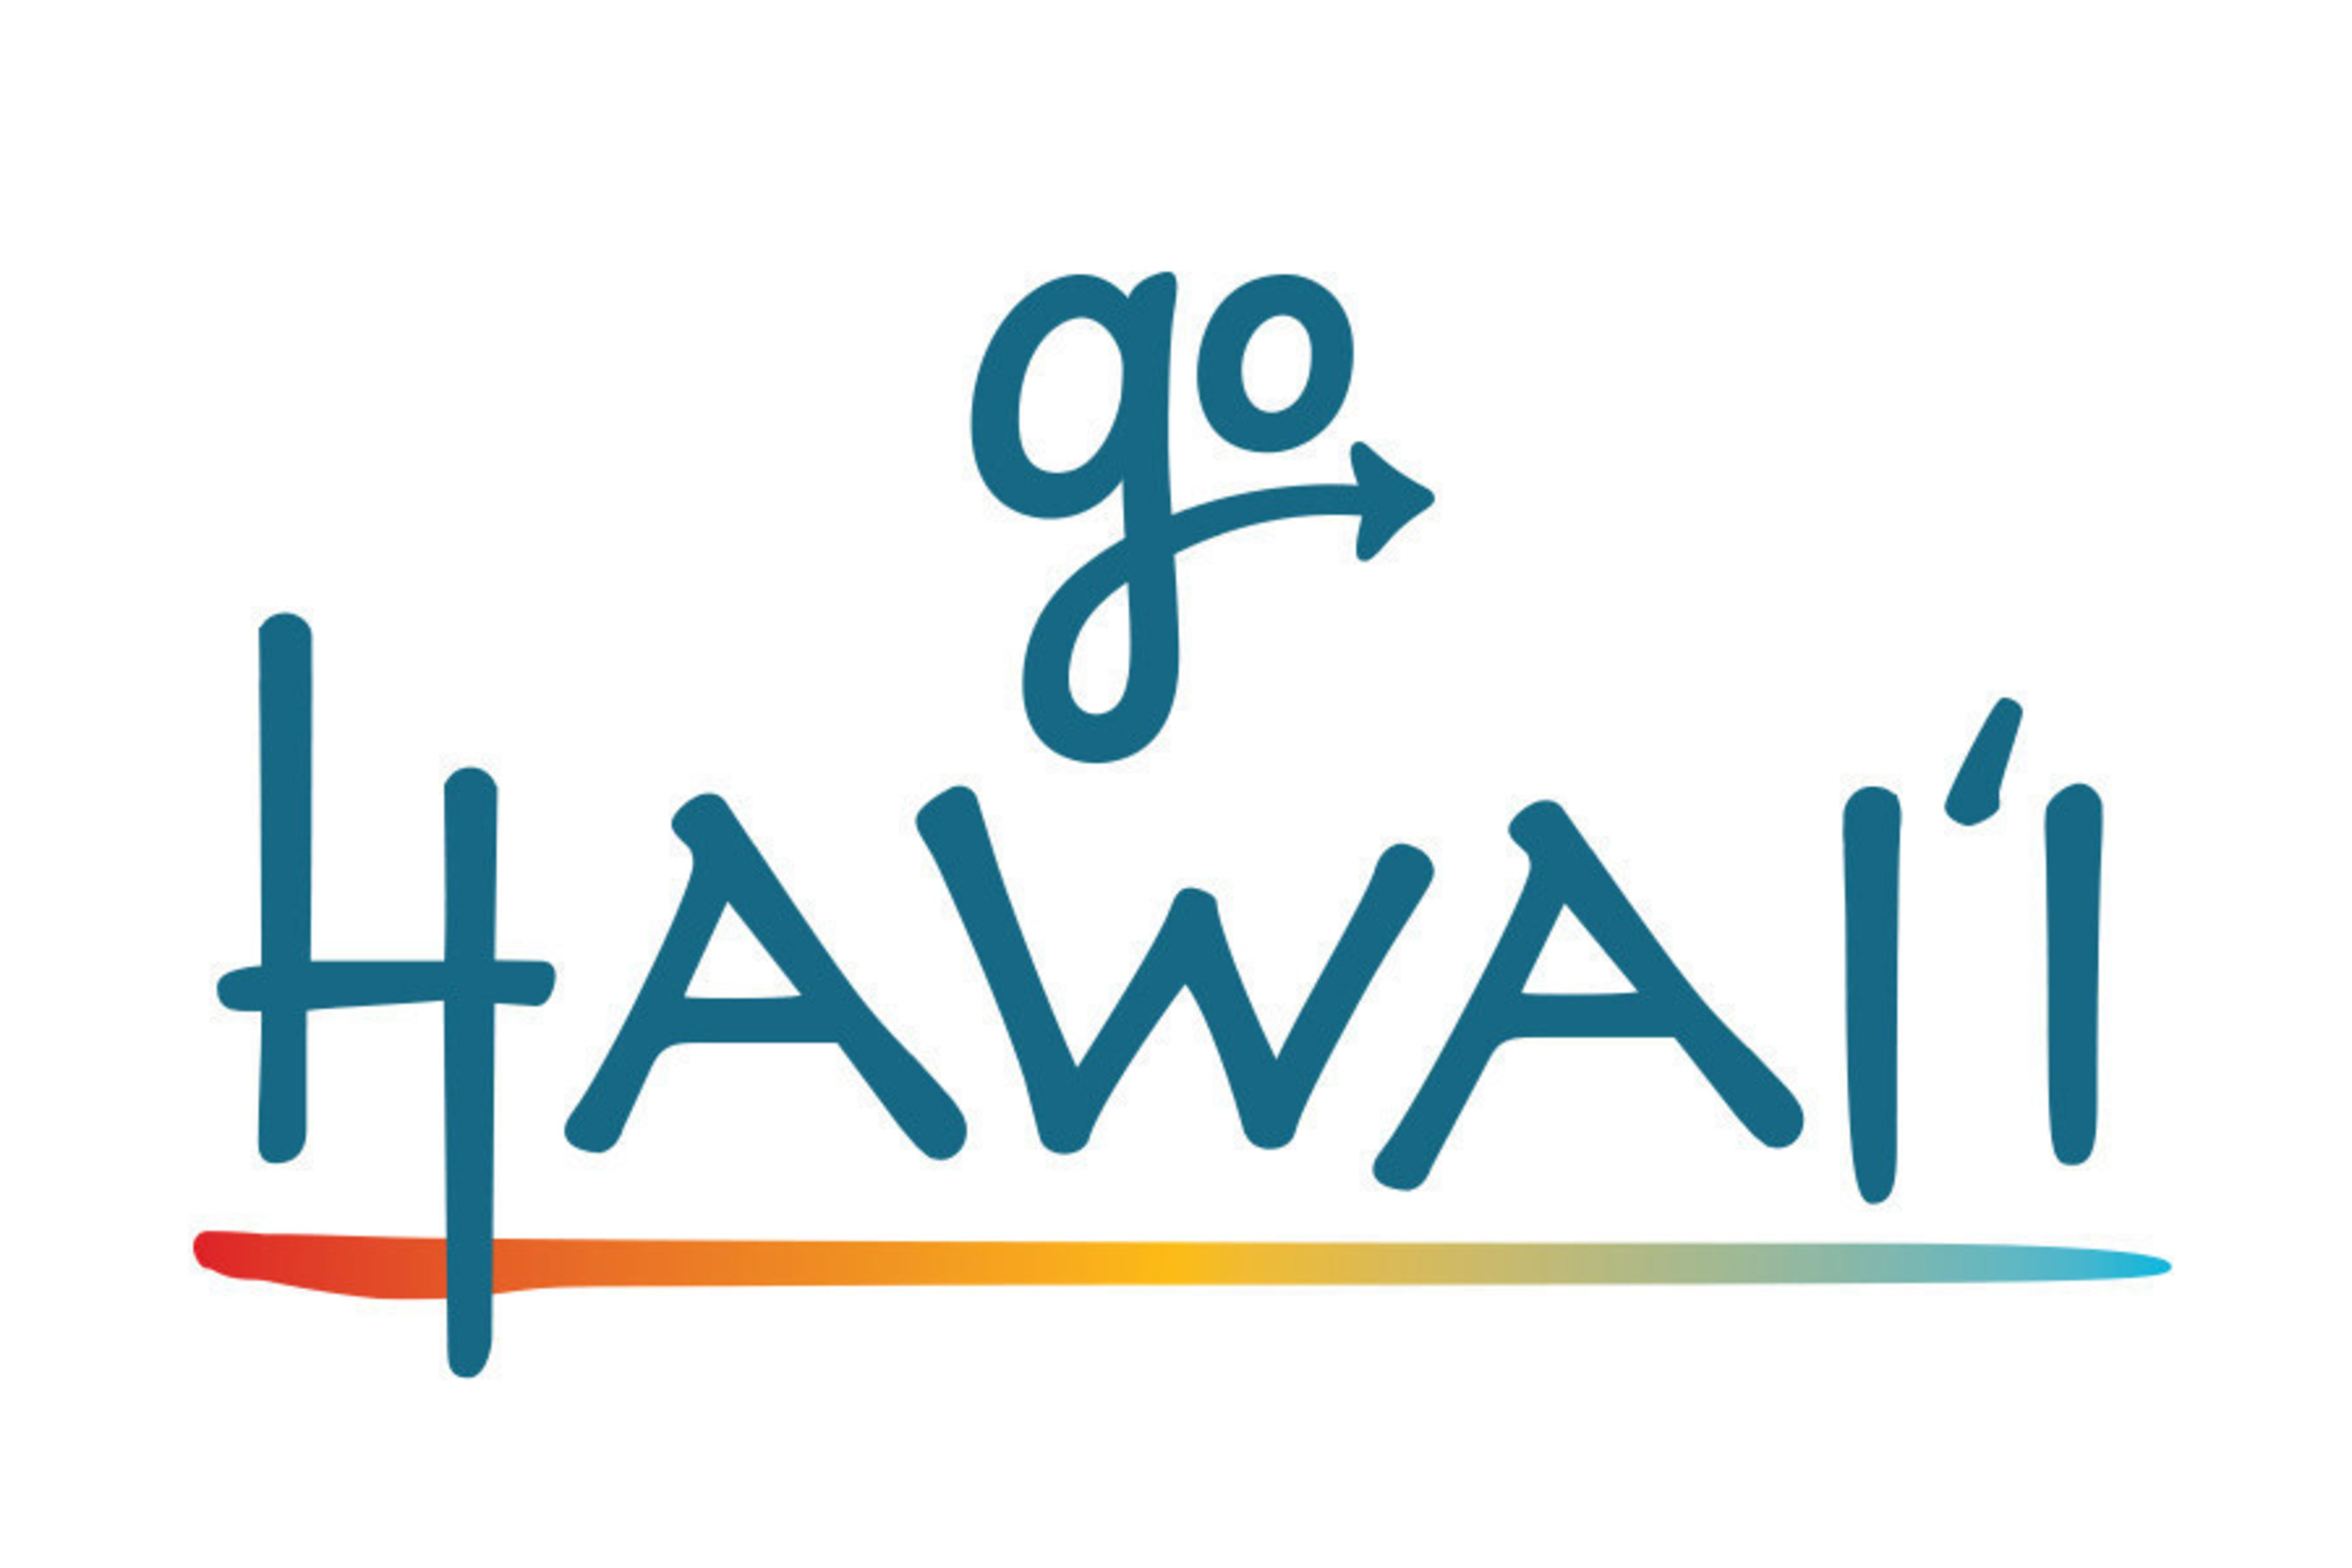 Created by the Hawaii Tourism Authority, the GoHawaii mobile app provides valuable travel tips for the six major Hawaiian Islands: Kauai, Oahu, Maui, Molokai, Lanai and the Island of Hawaii.